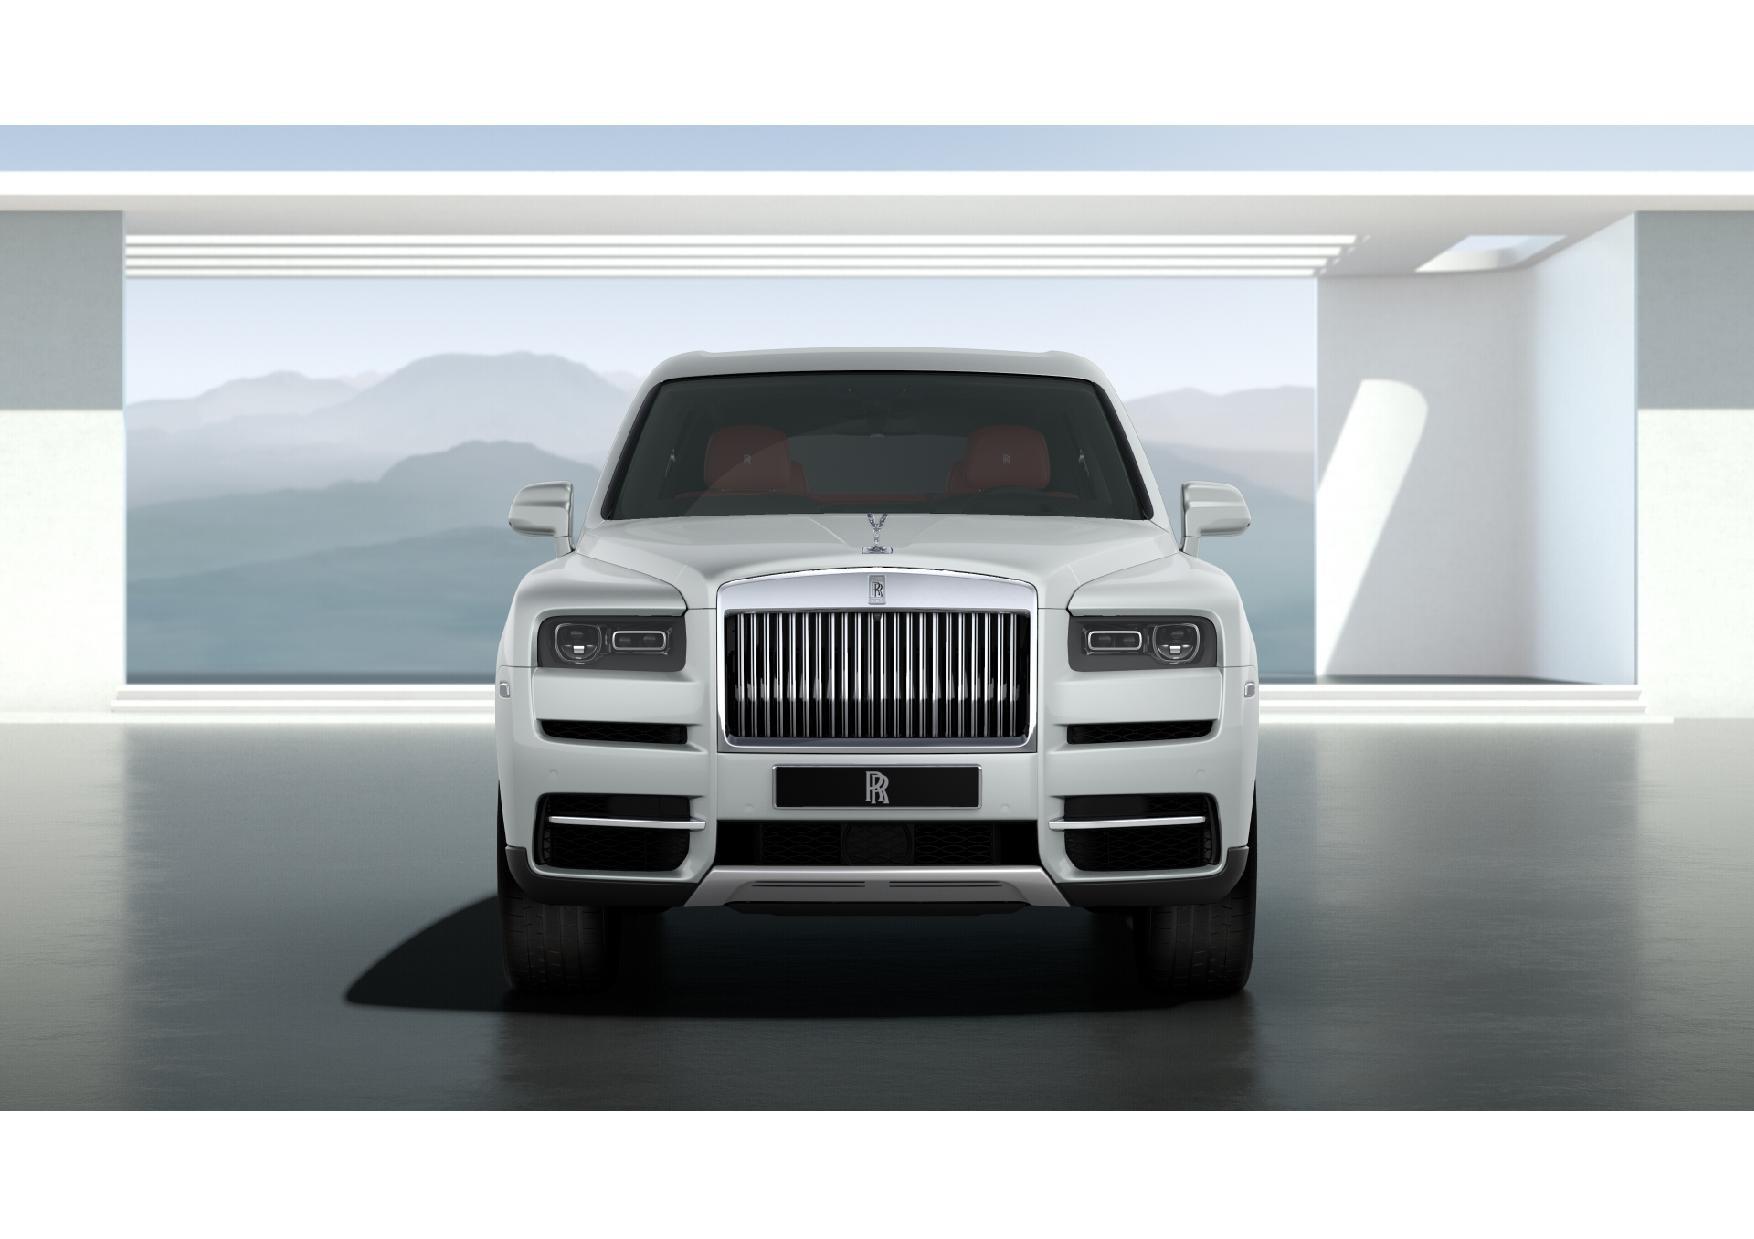 New 2021 Rolls-Royce Cullinan for sale $383,850 at McLaren Greenwich in Greenwich CT 06830 1